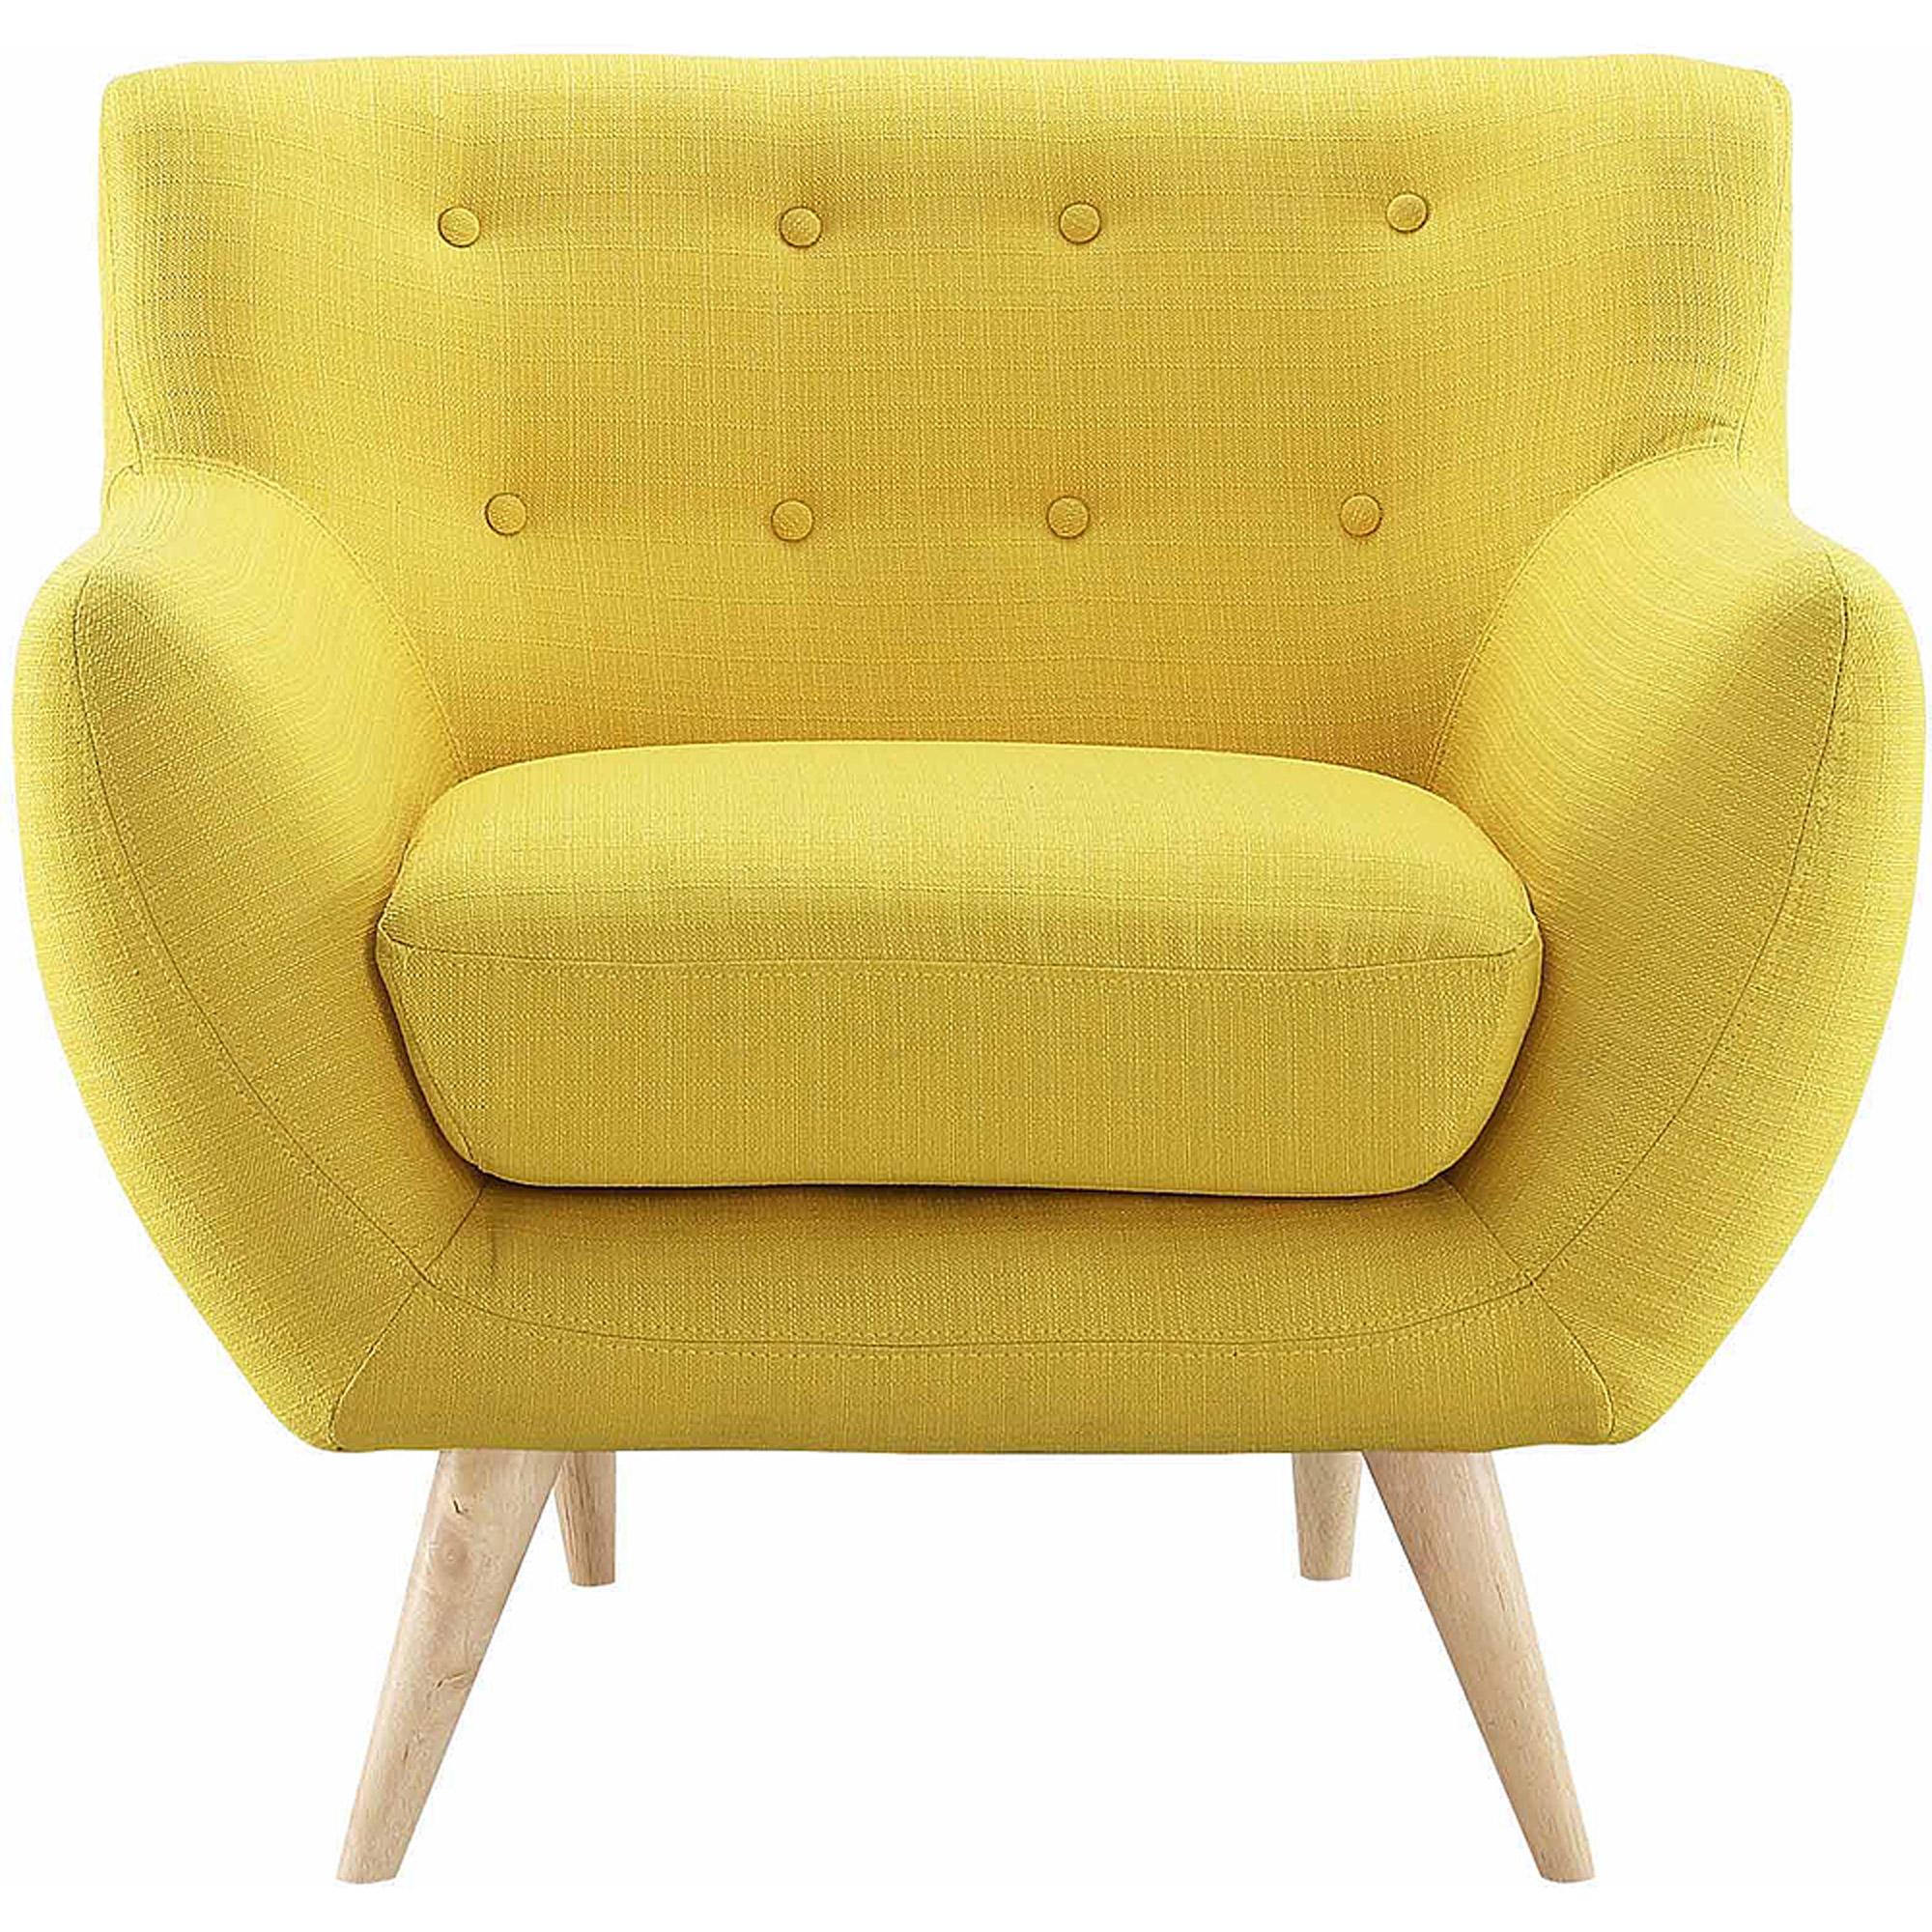 Modway Remark Armchair, Multiple Colors